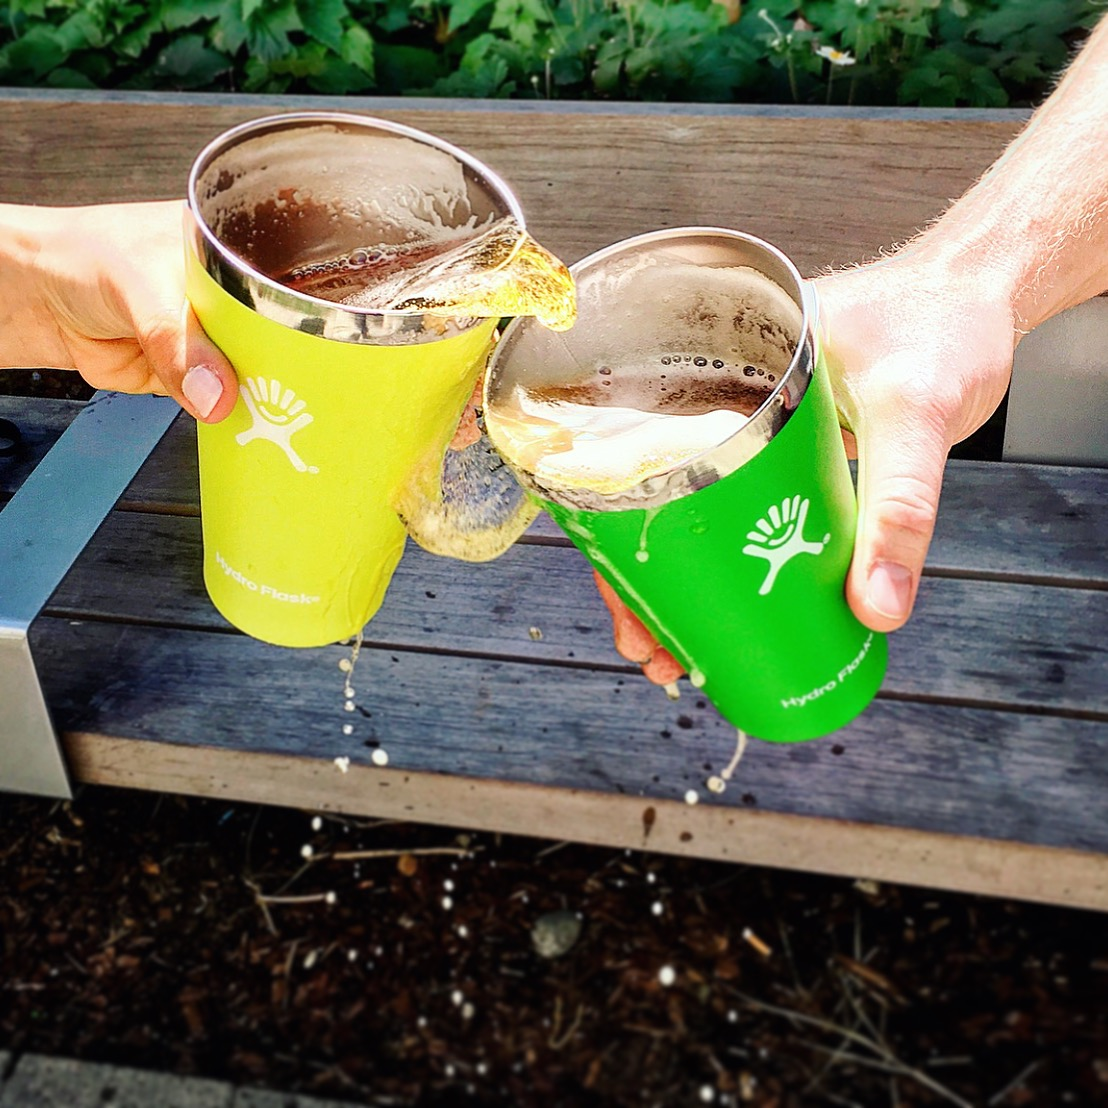 Two hydro flasks splashing together